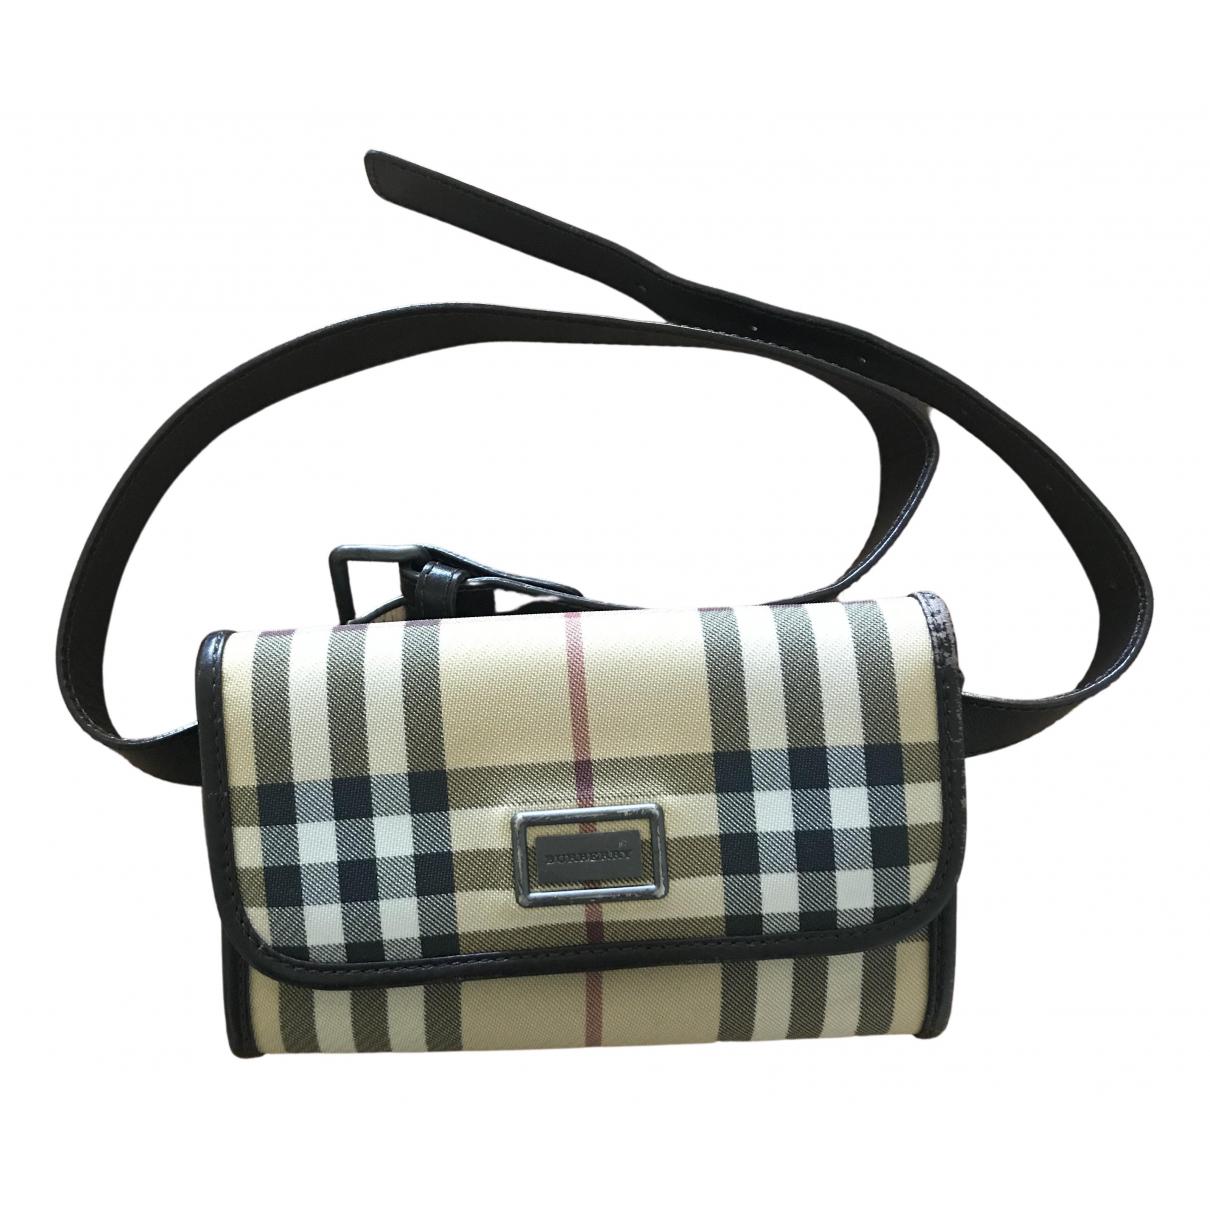 Burberry Bum Bag Clutch in  Kamel Synthetik